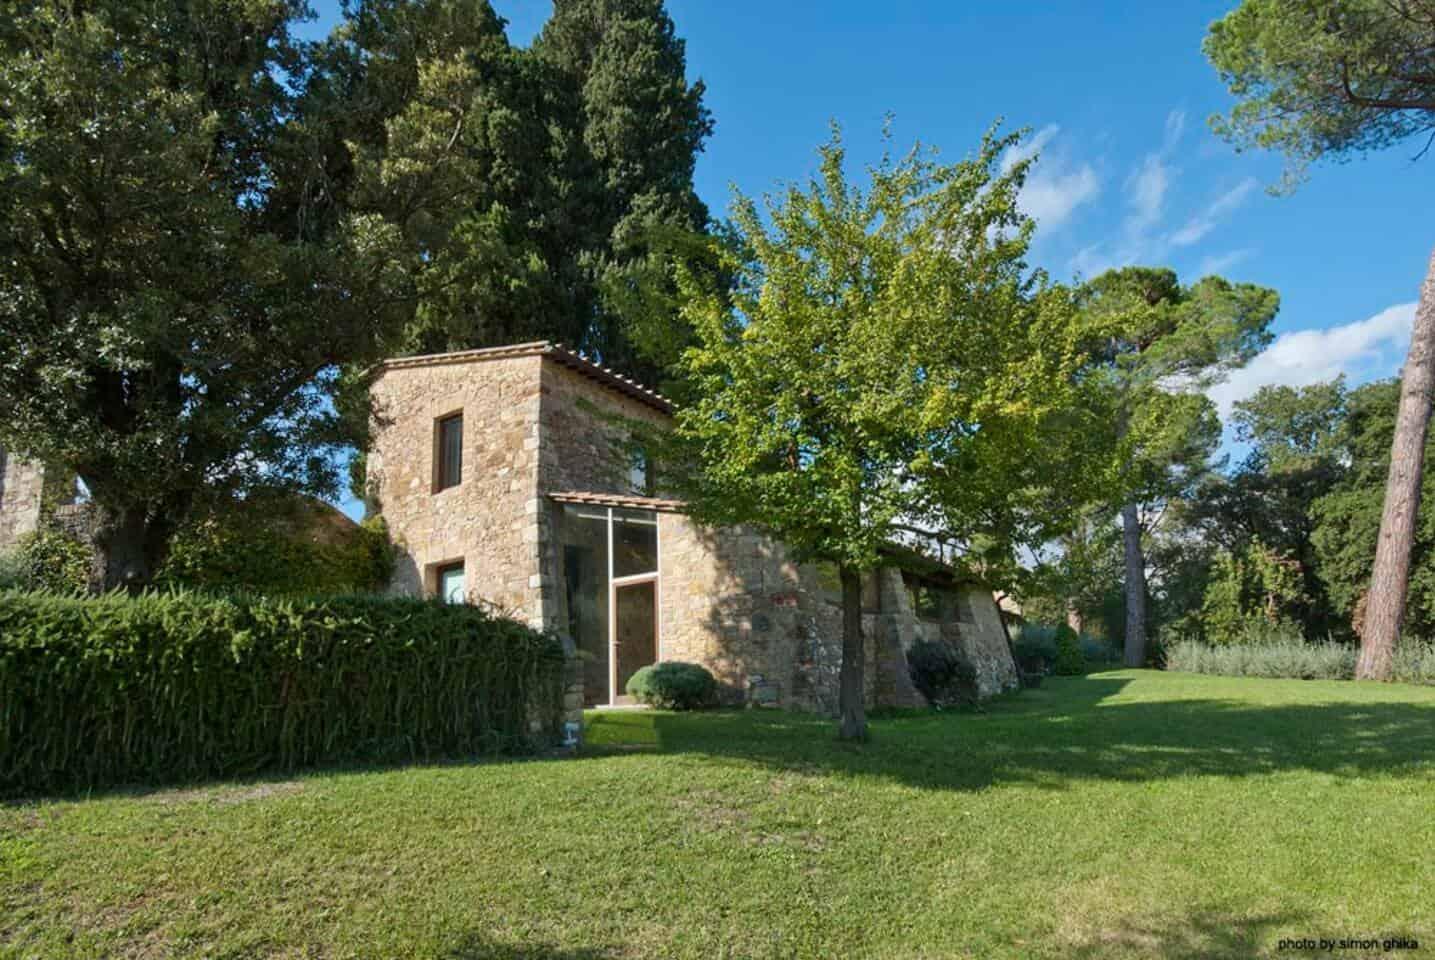 Image of Airbnb rental in Siena, Italy